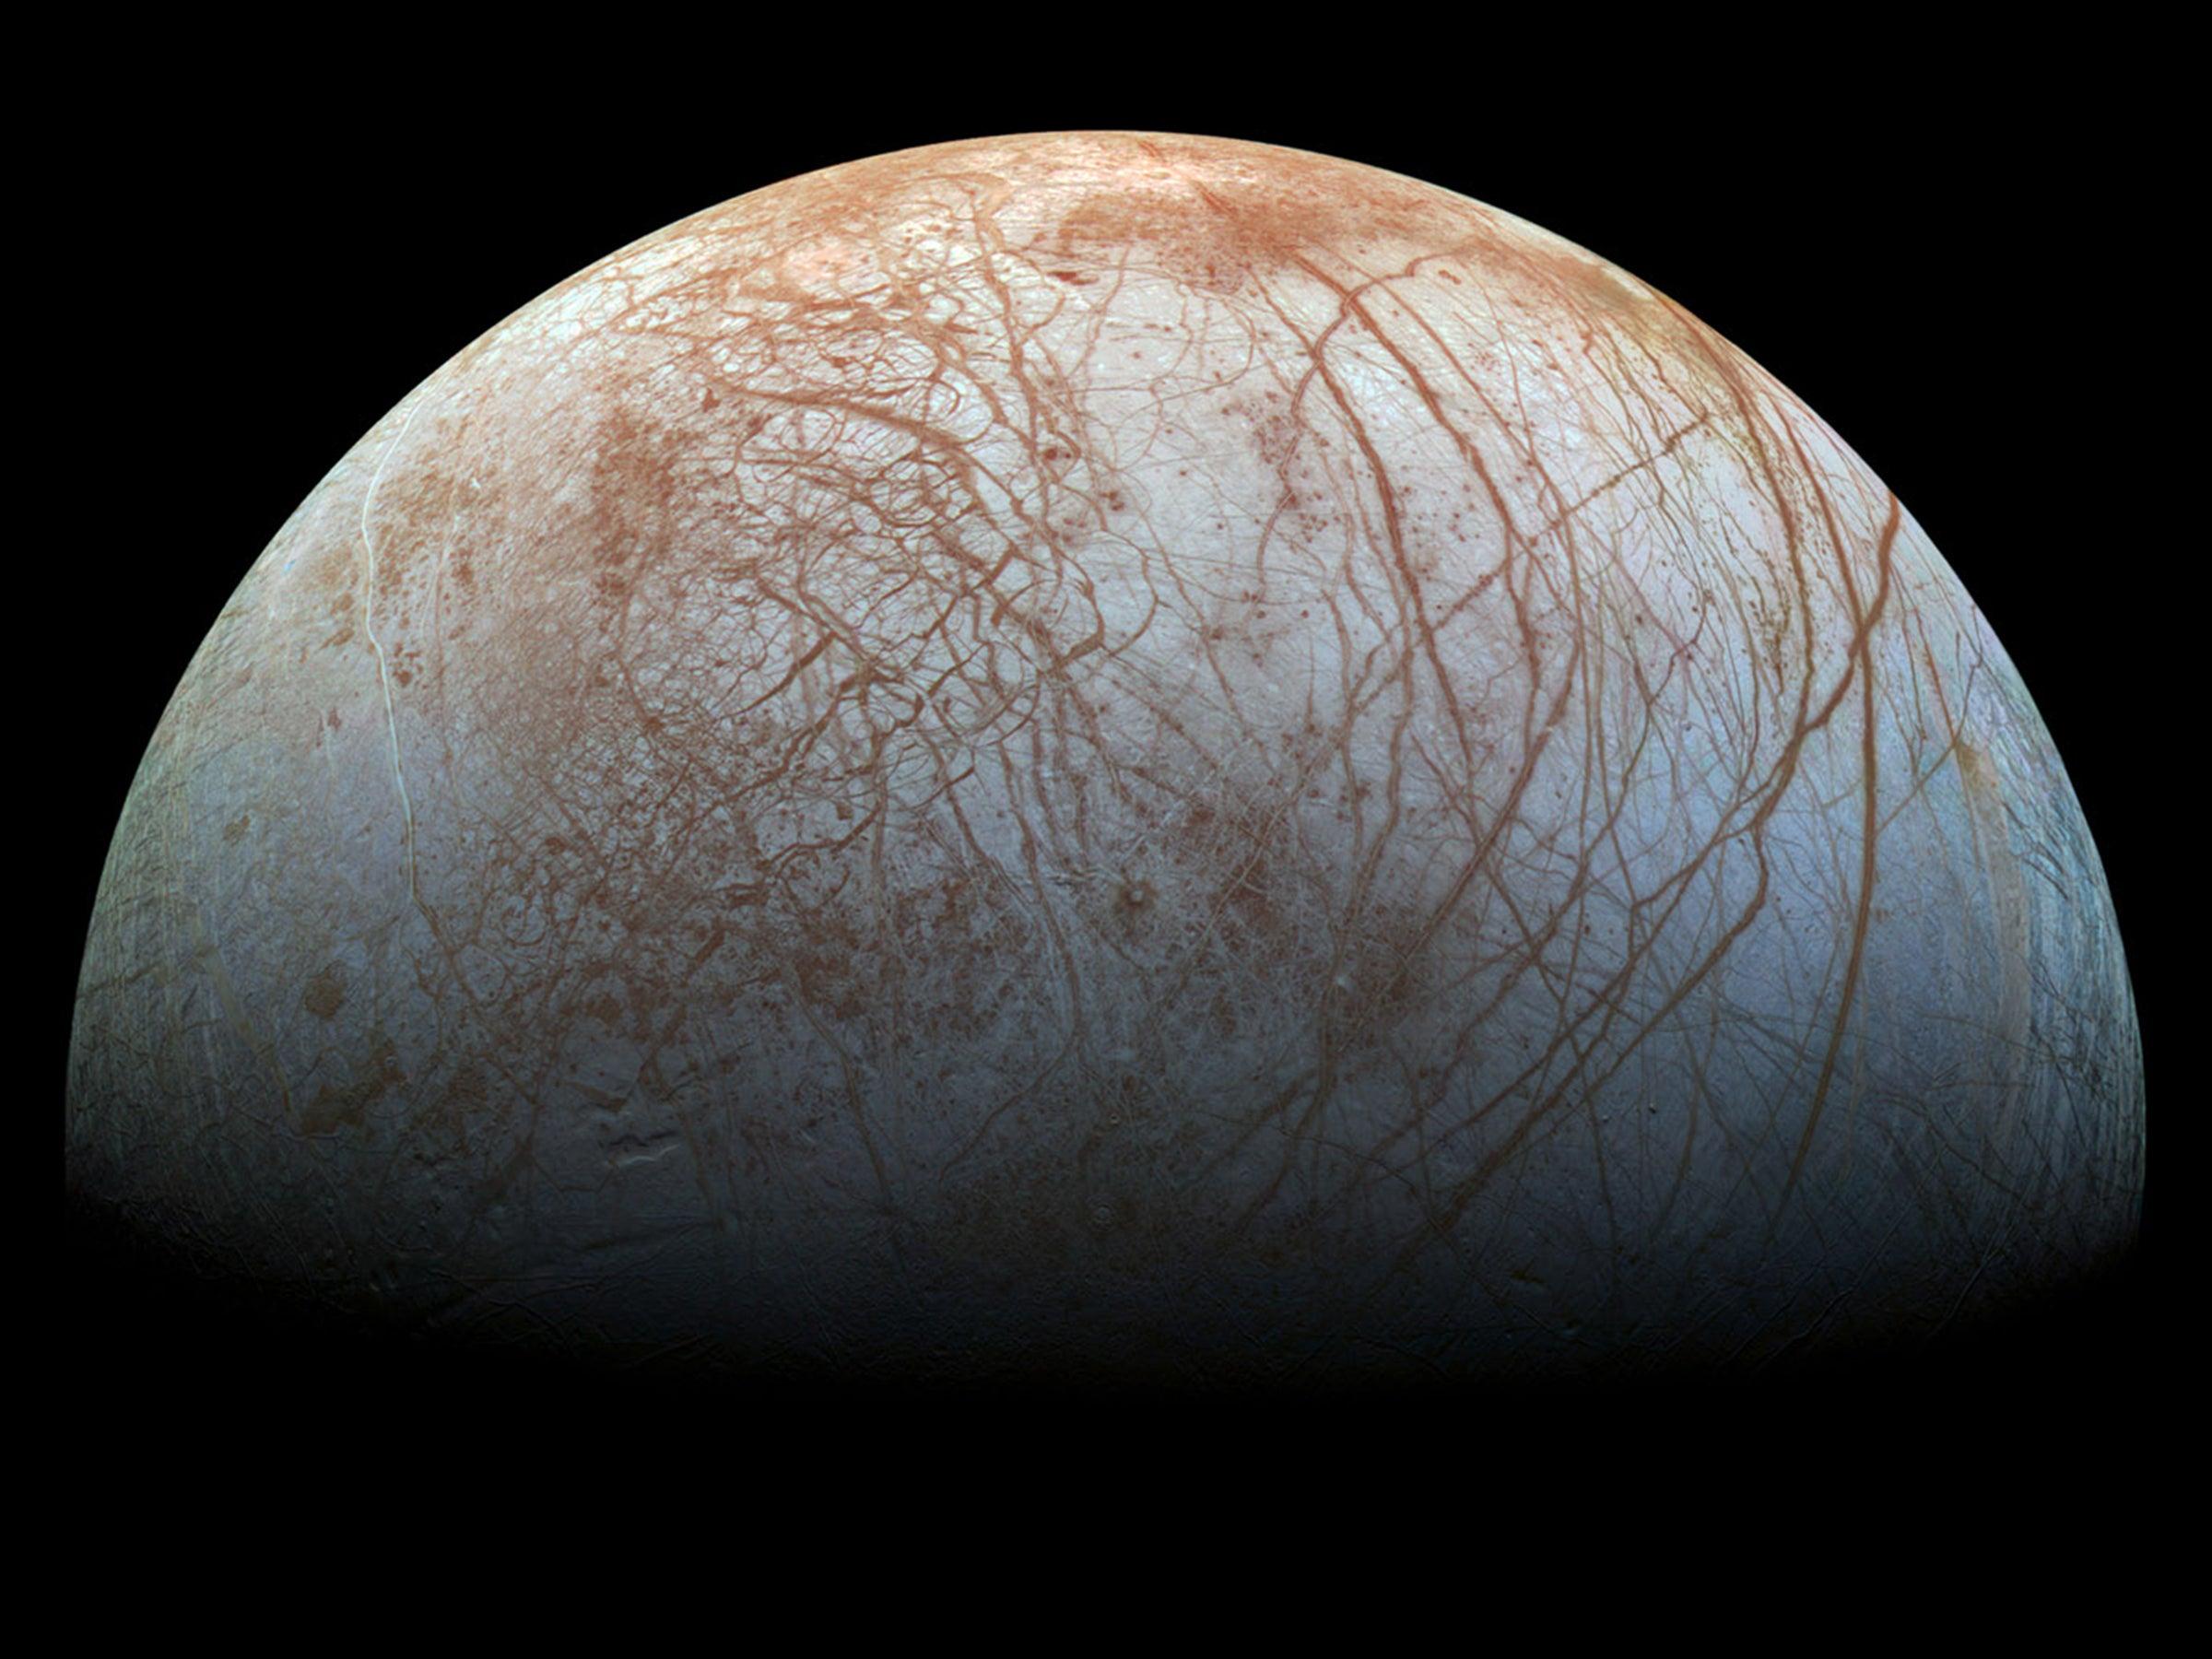 NASA Moves Forward With Mission To Explore Jupiter's Moon Europa